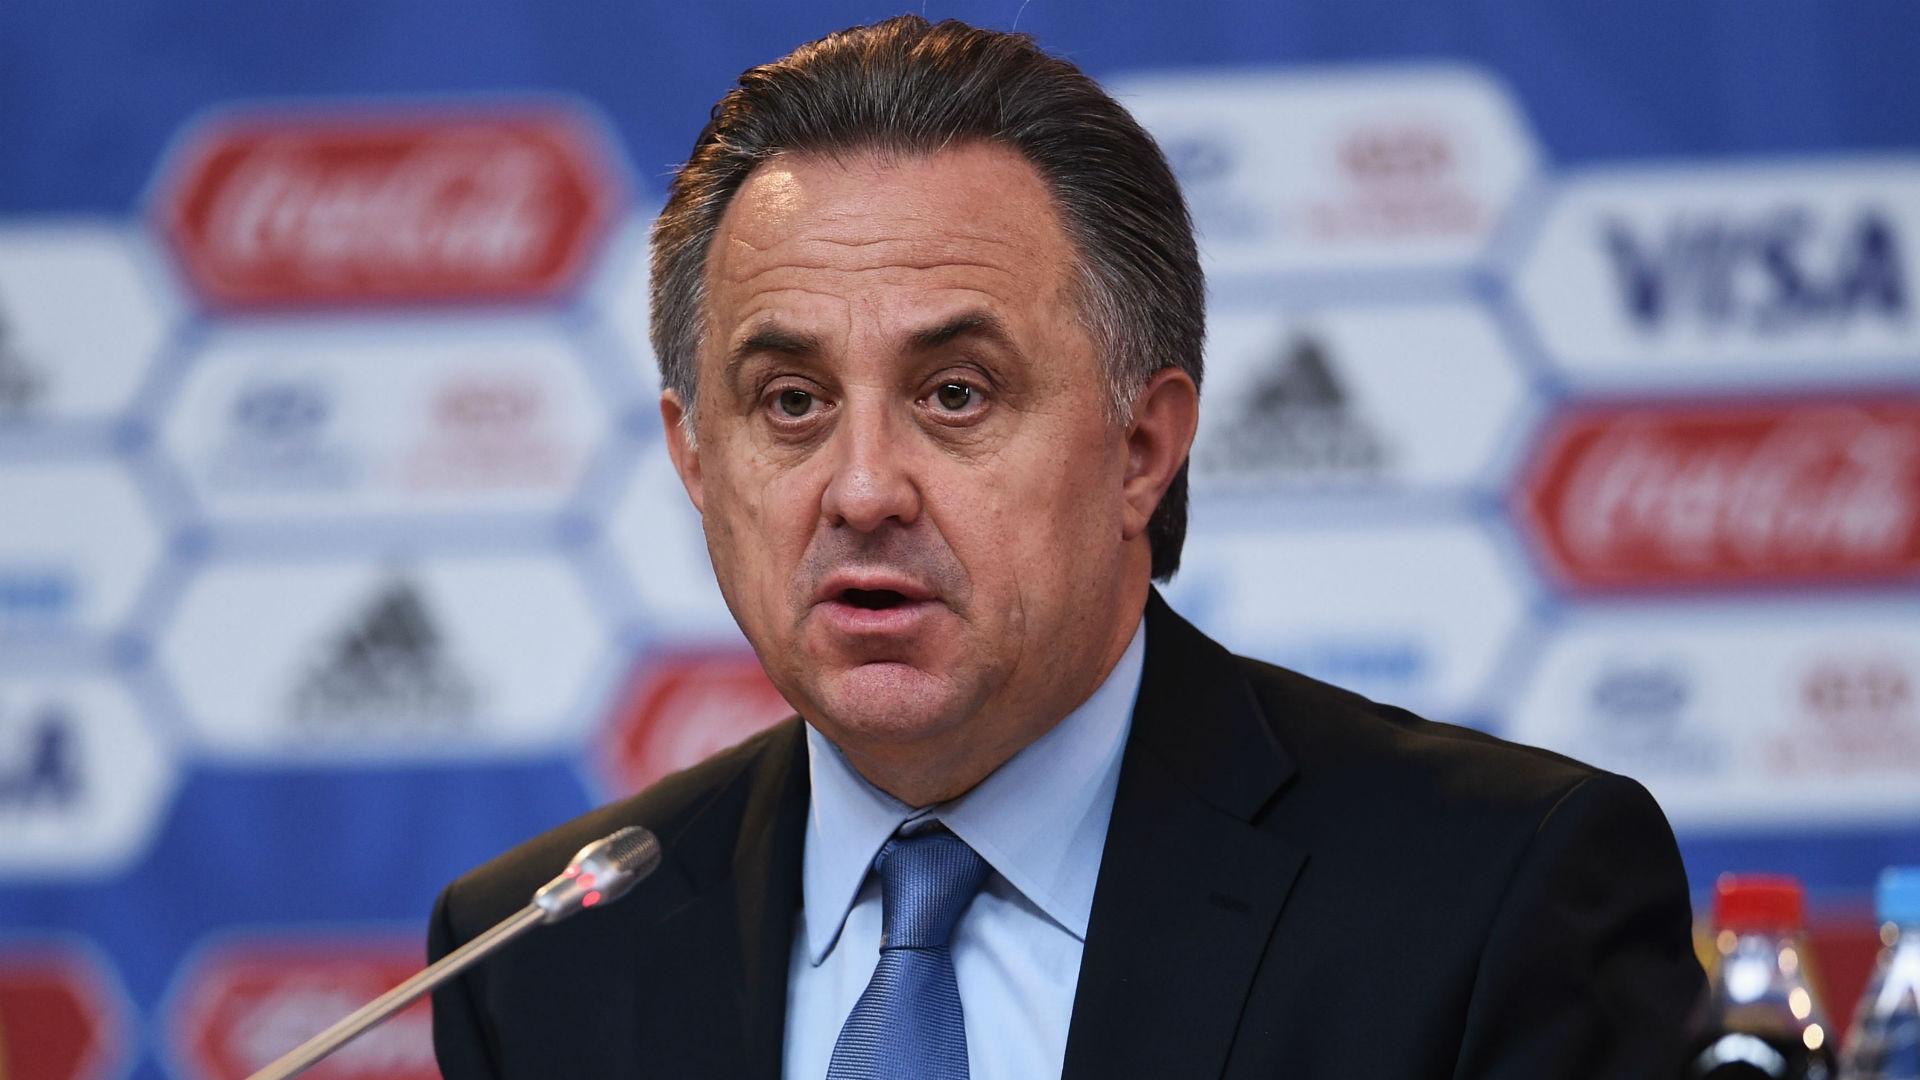 Federation Internationale de Football Association chief praises Russia's preparations for 2018 World Cup